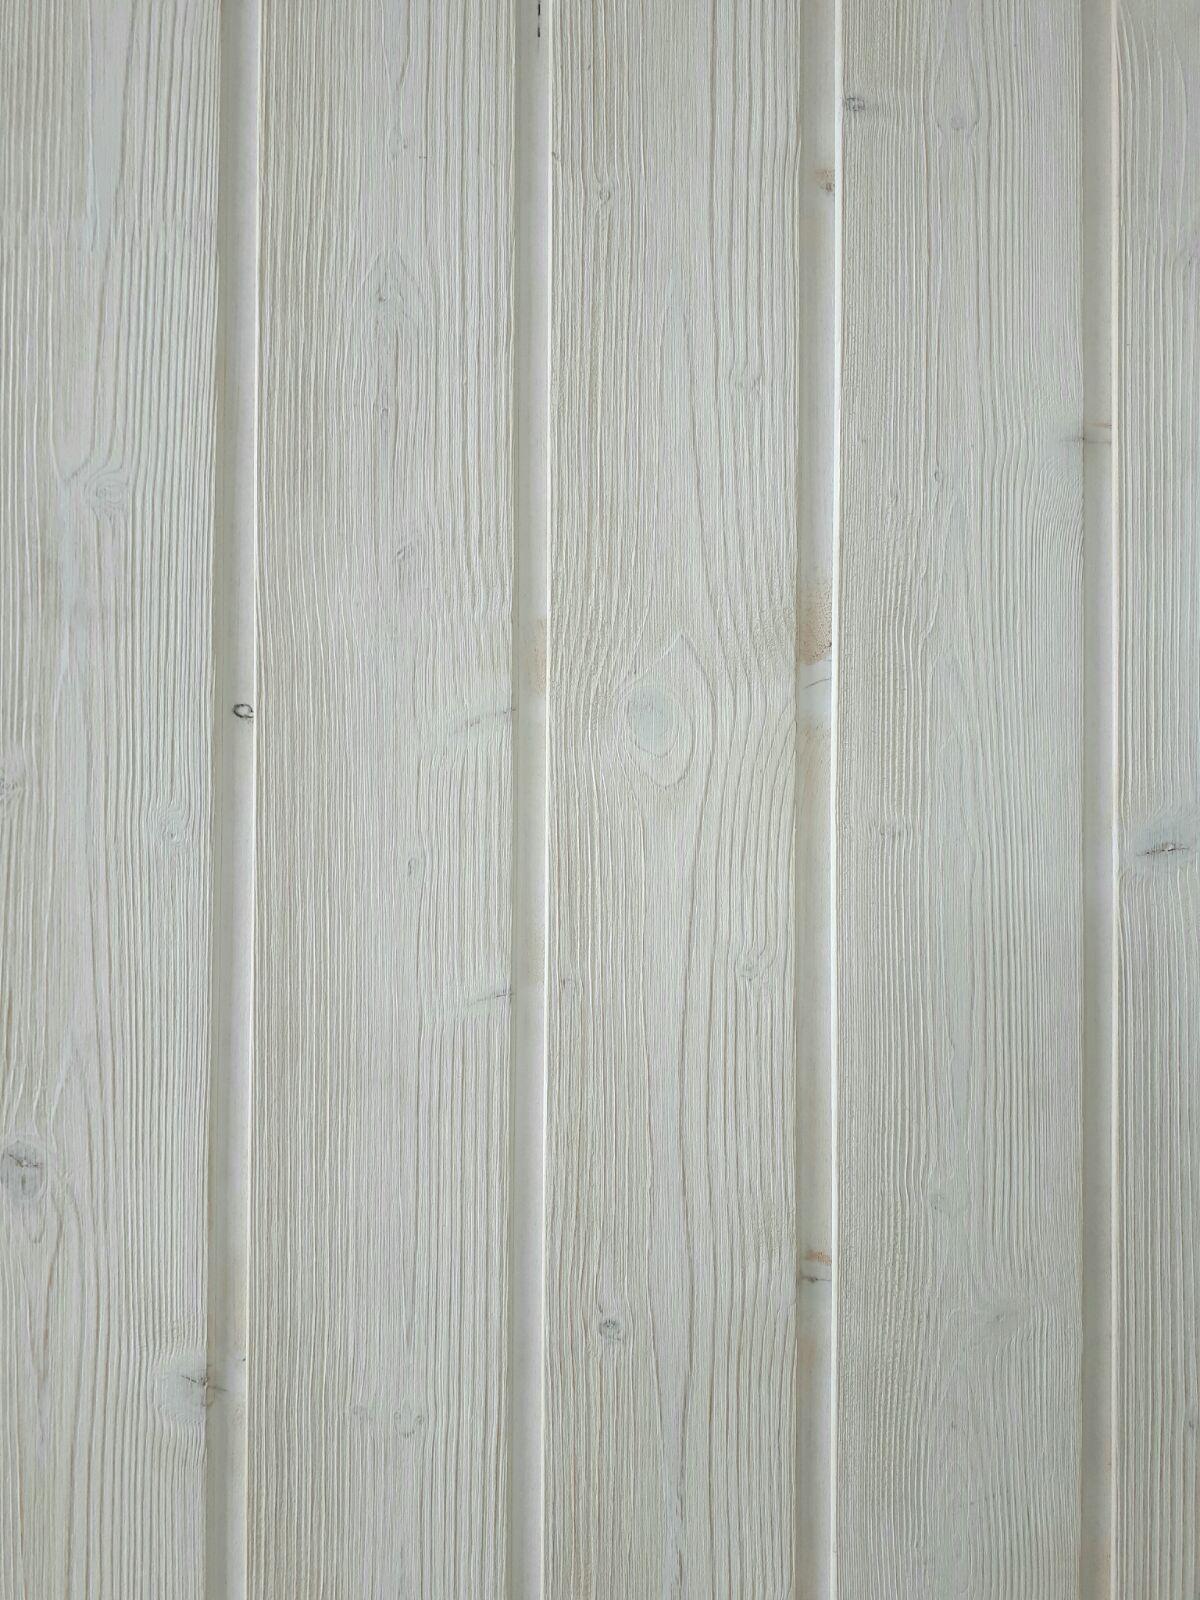 Friso abeto blanco maderas garcia diego - Friso para exterior ...